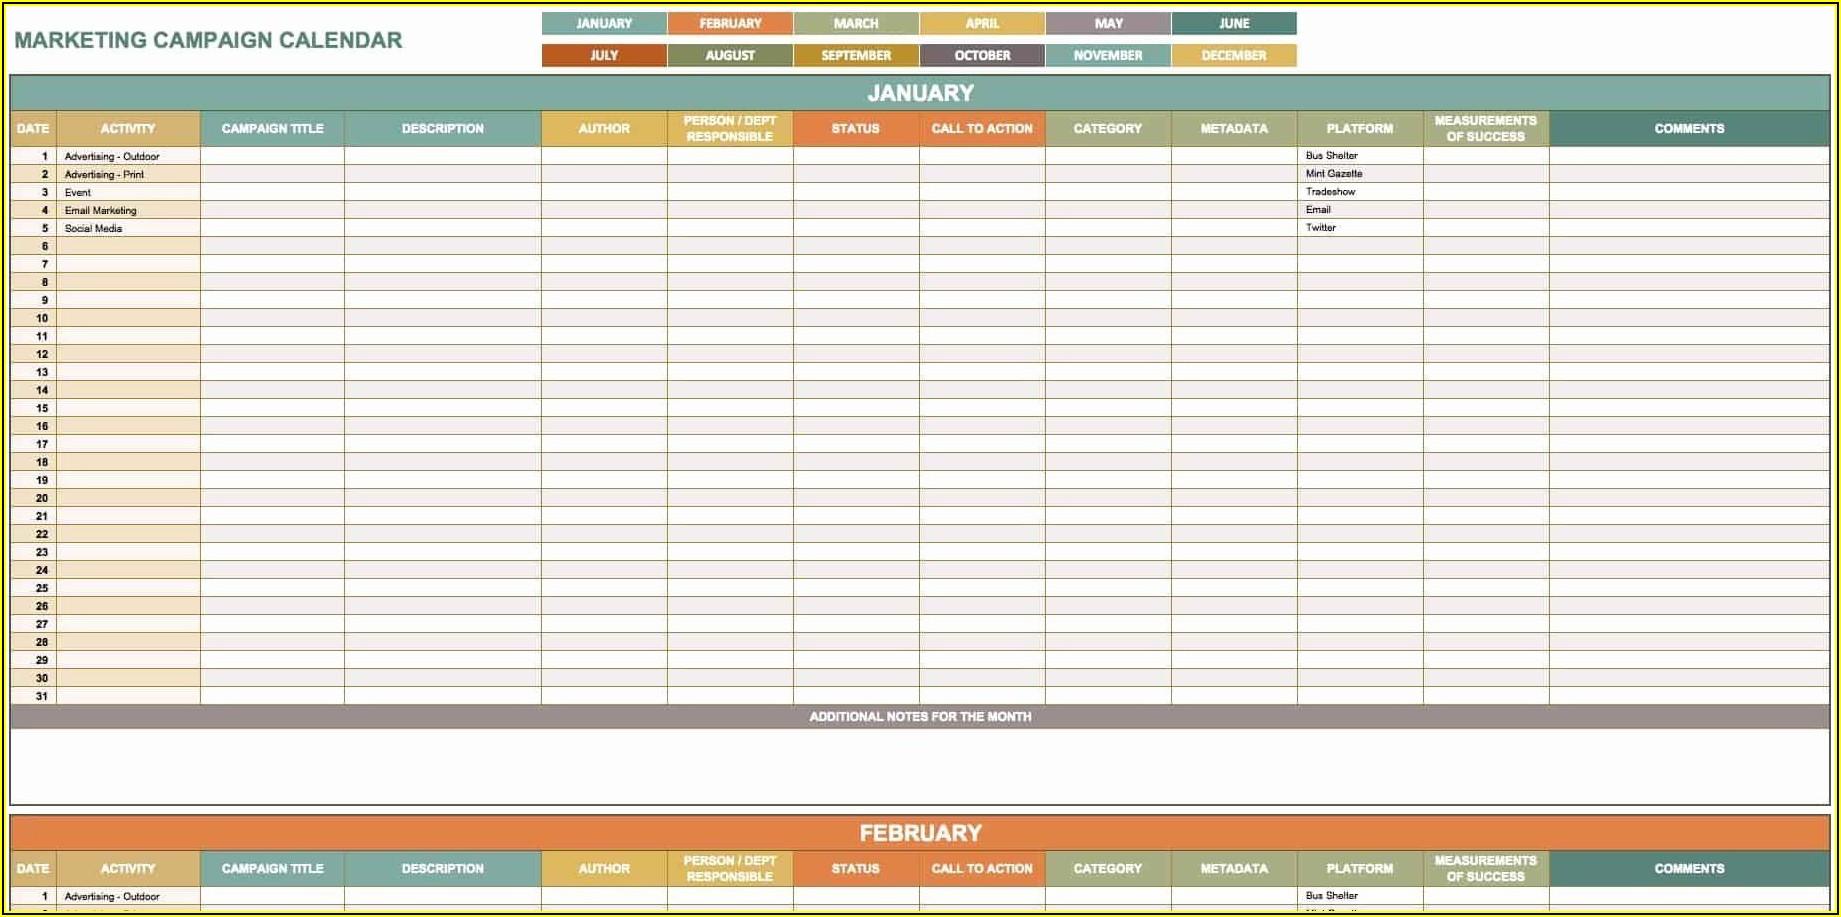 Content Marketing Calendar Template Free